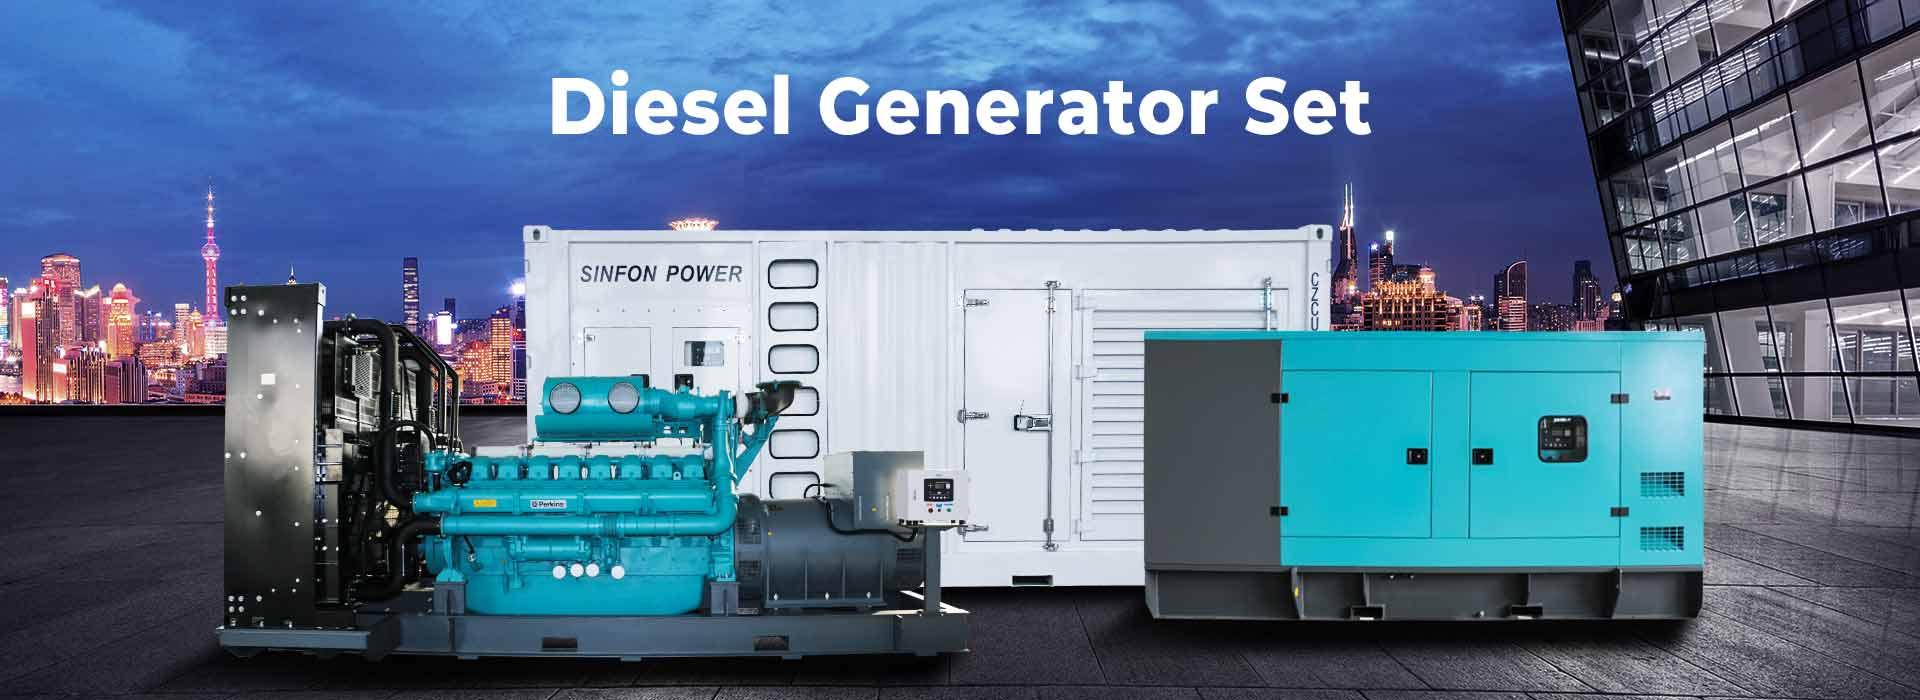 mpmc generator, millennium power manufacturing corp, abbats, powertech generator parts